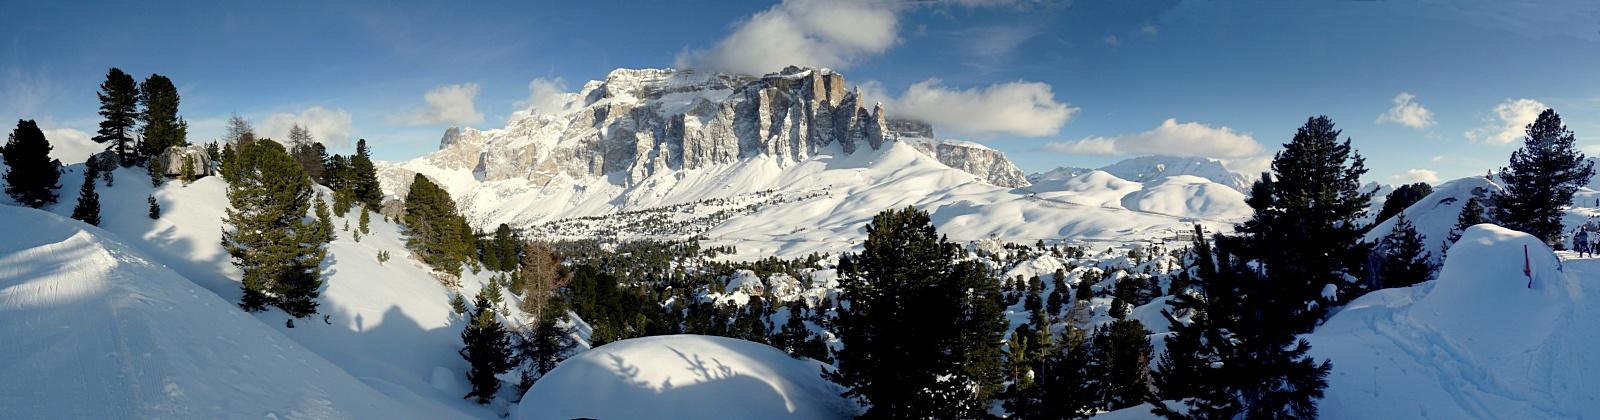 Sella ronda panorama, Val Gardena